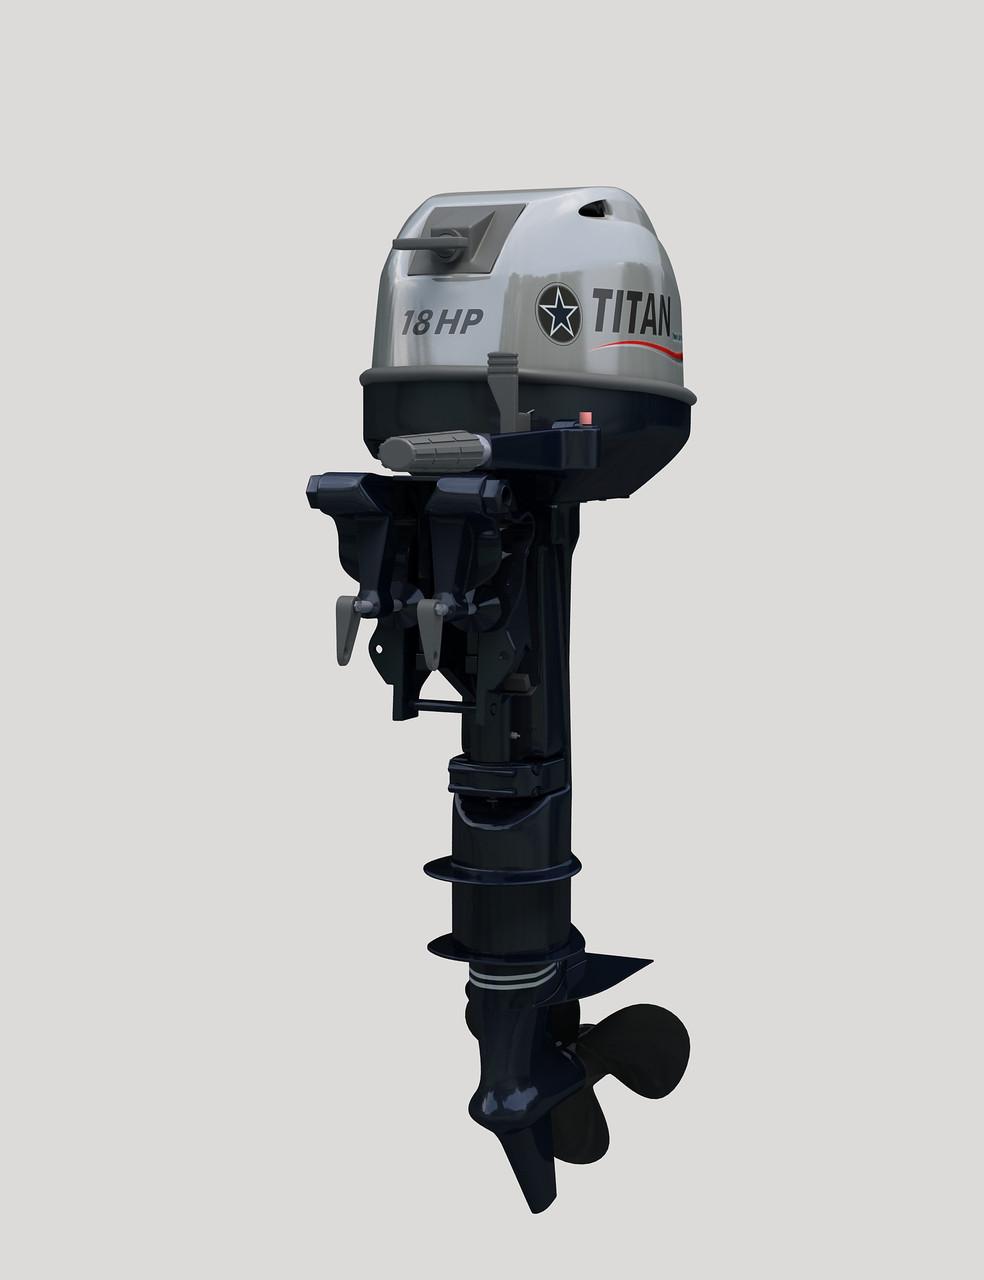 Titan TP 15 AMHS